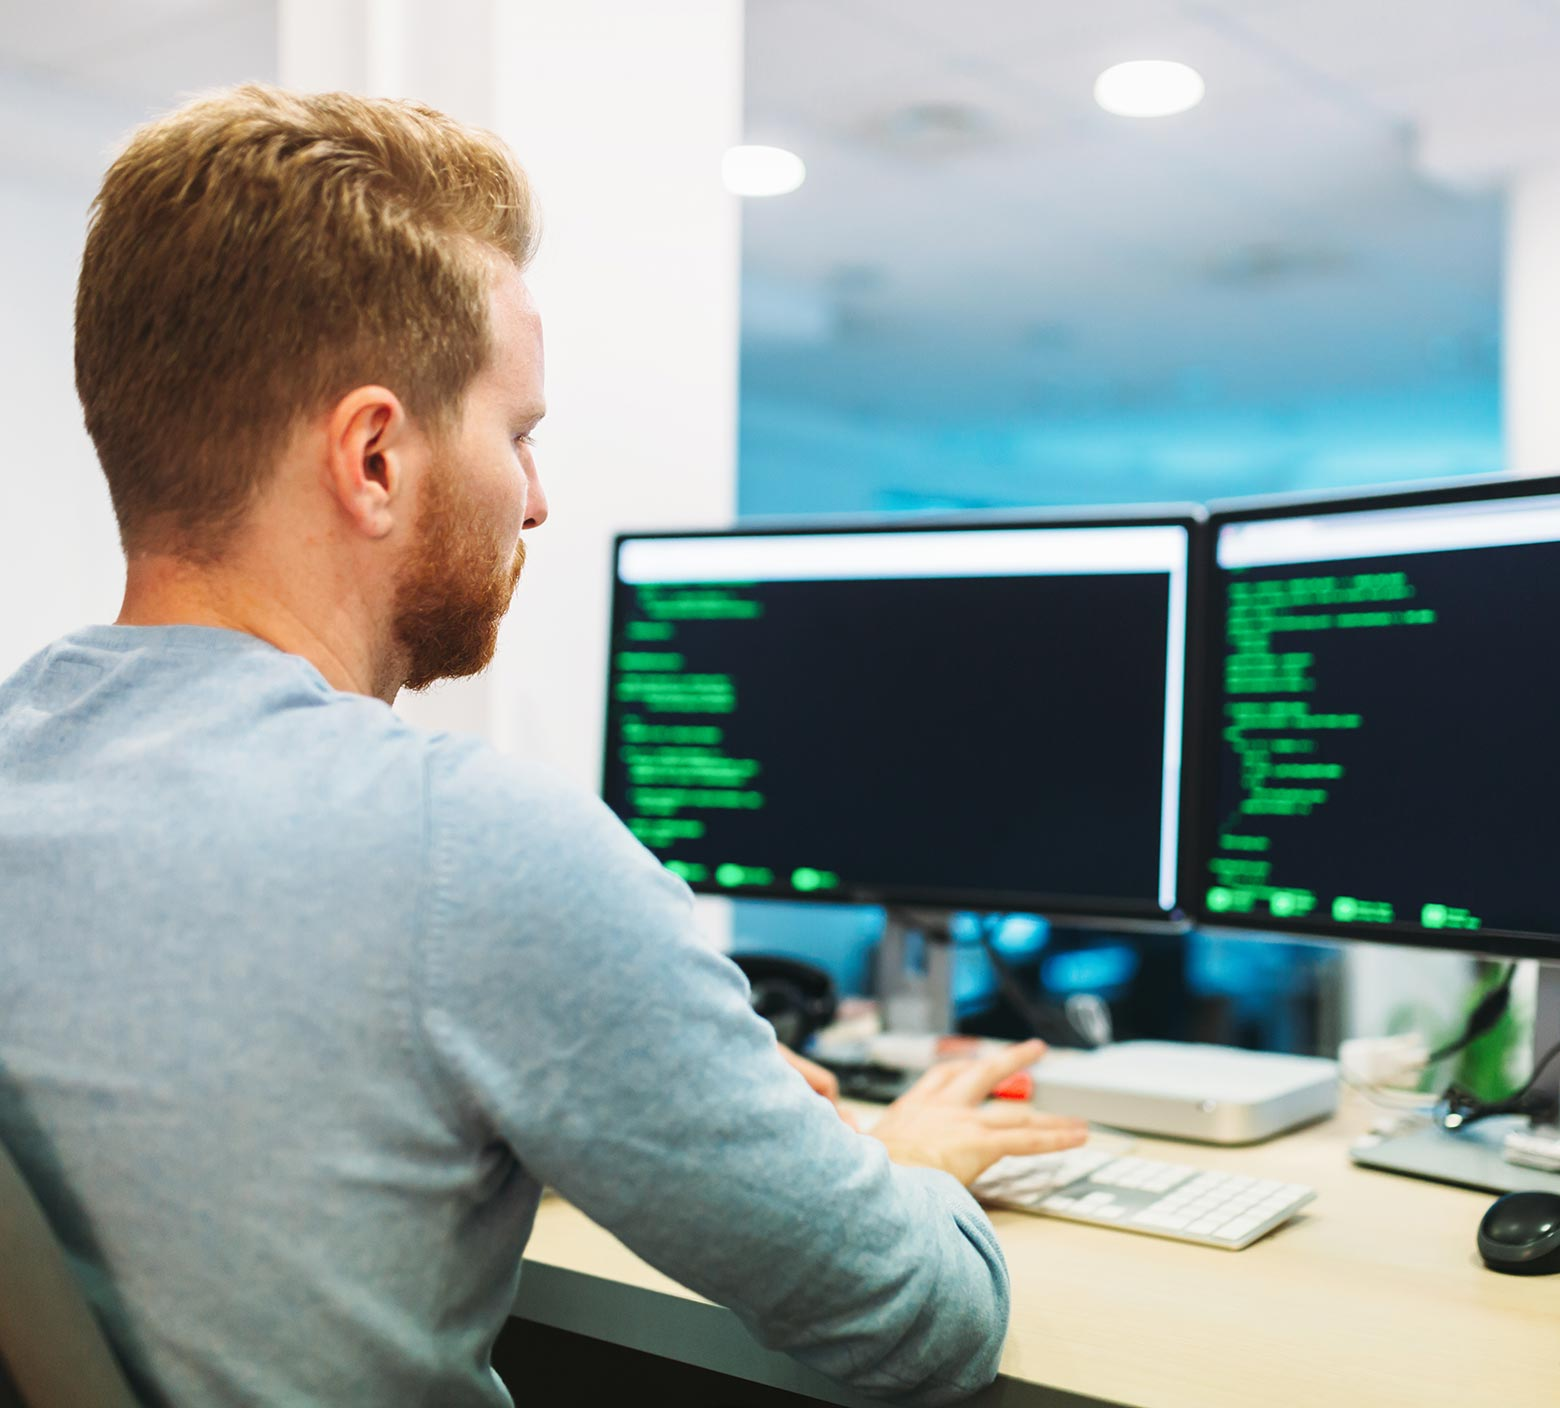 Data Analyst analysing lines of code on his desktop, doing predictive analytics